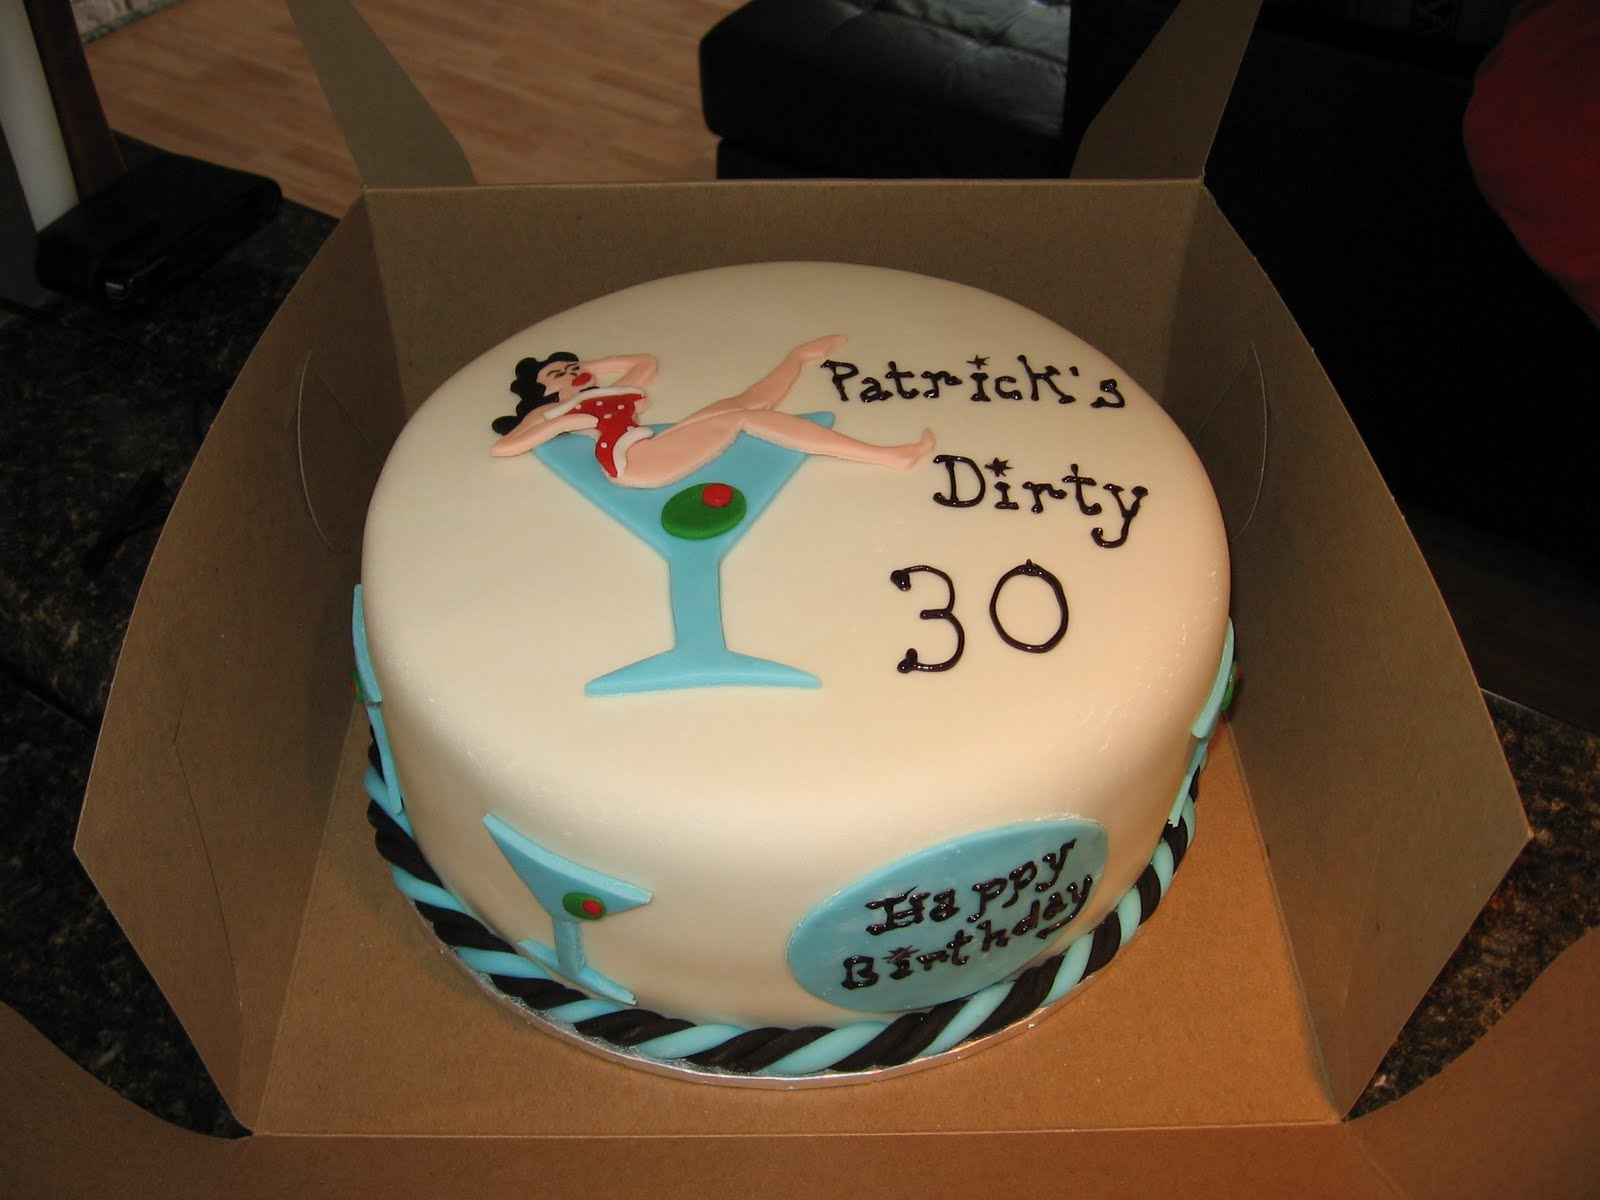 Terrific 12 Dirty 30 Cakes Photo Dirty 30 Birthday Cake Ideas Dirty Funny Birthday Cards Online Hetedamsfinfo